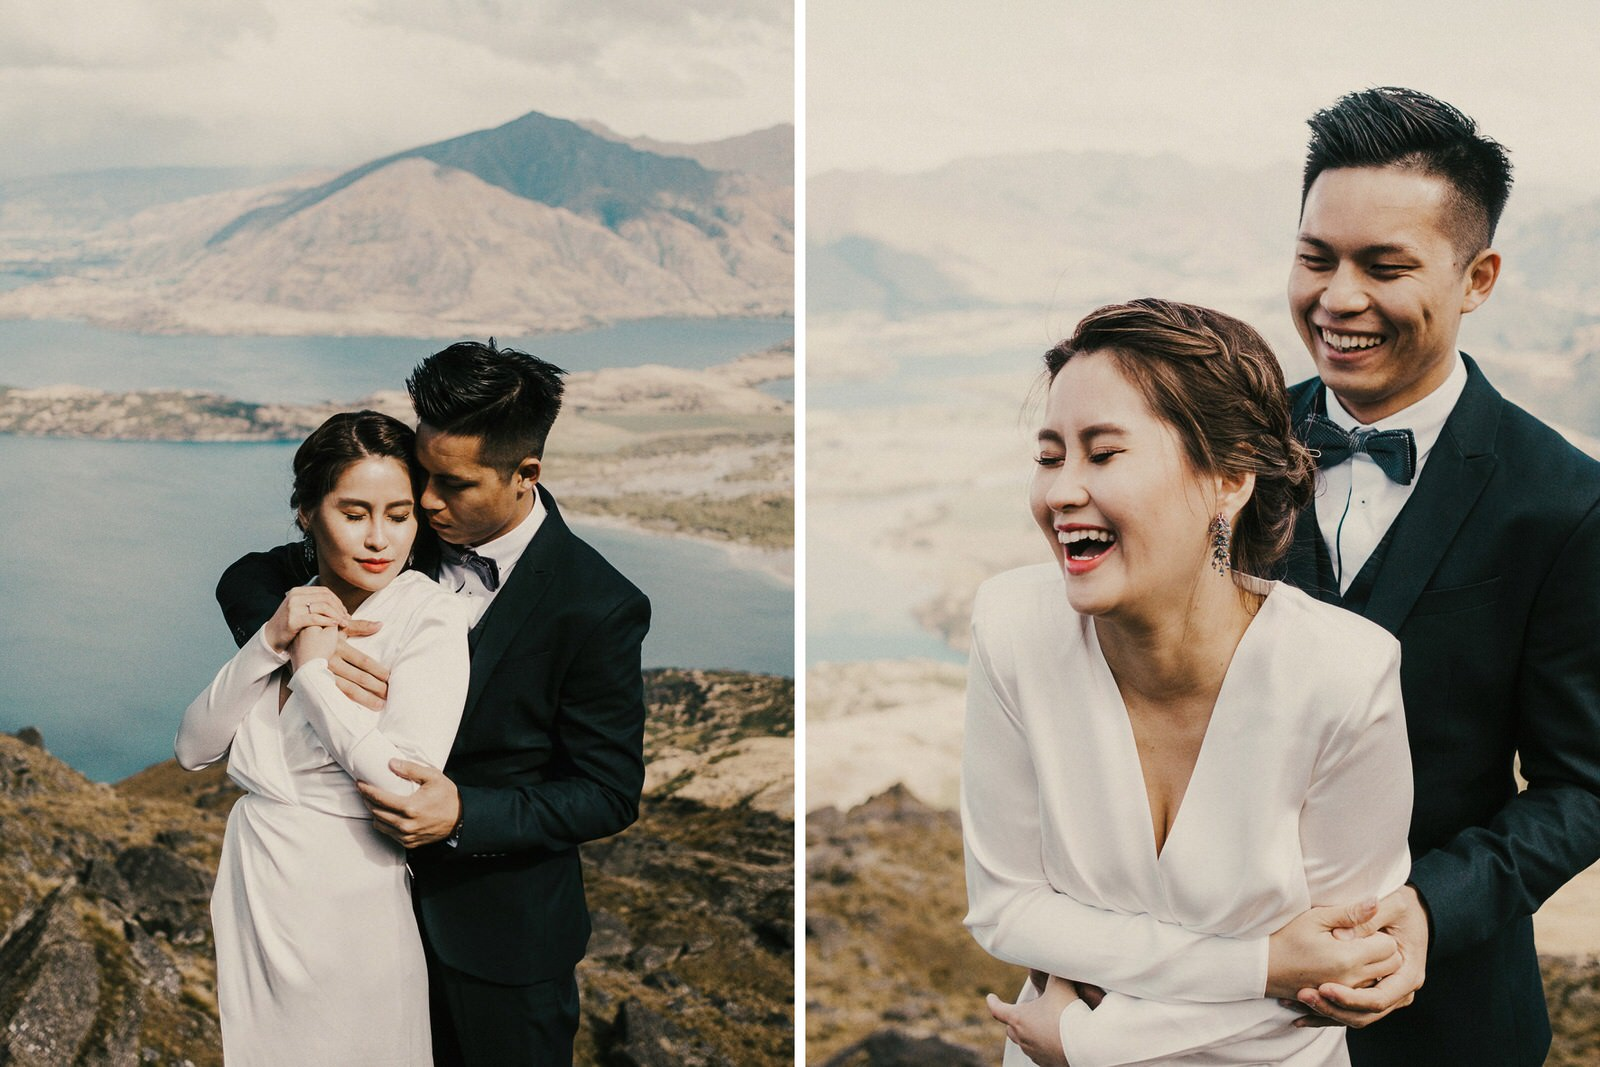 Pre-wedding photos at Lookout Hill, Lake Wanaka, New Zealand